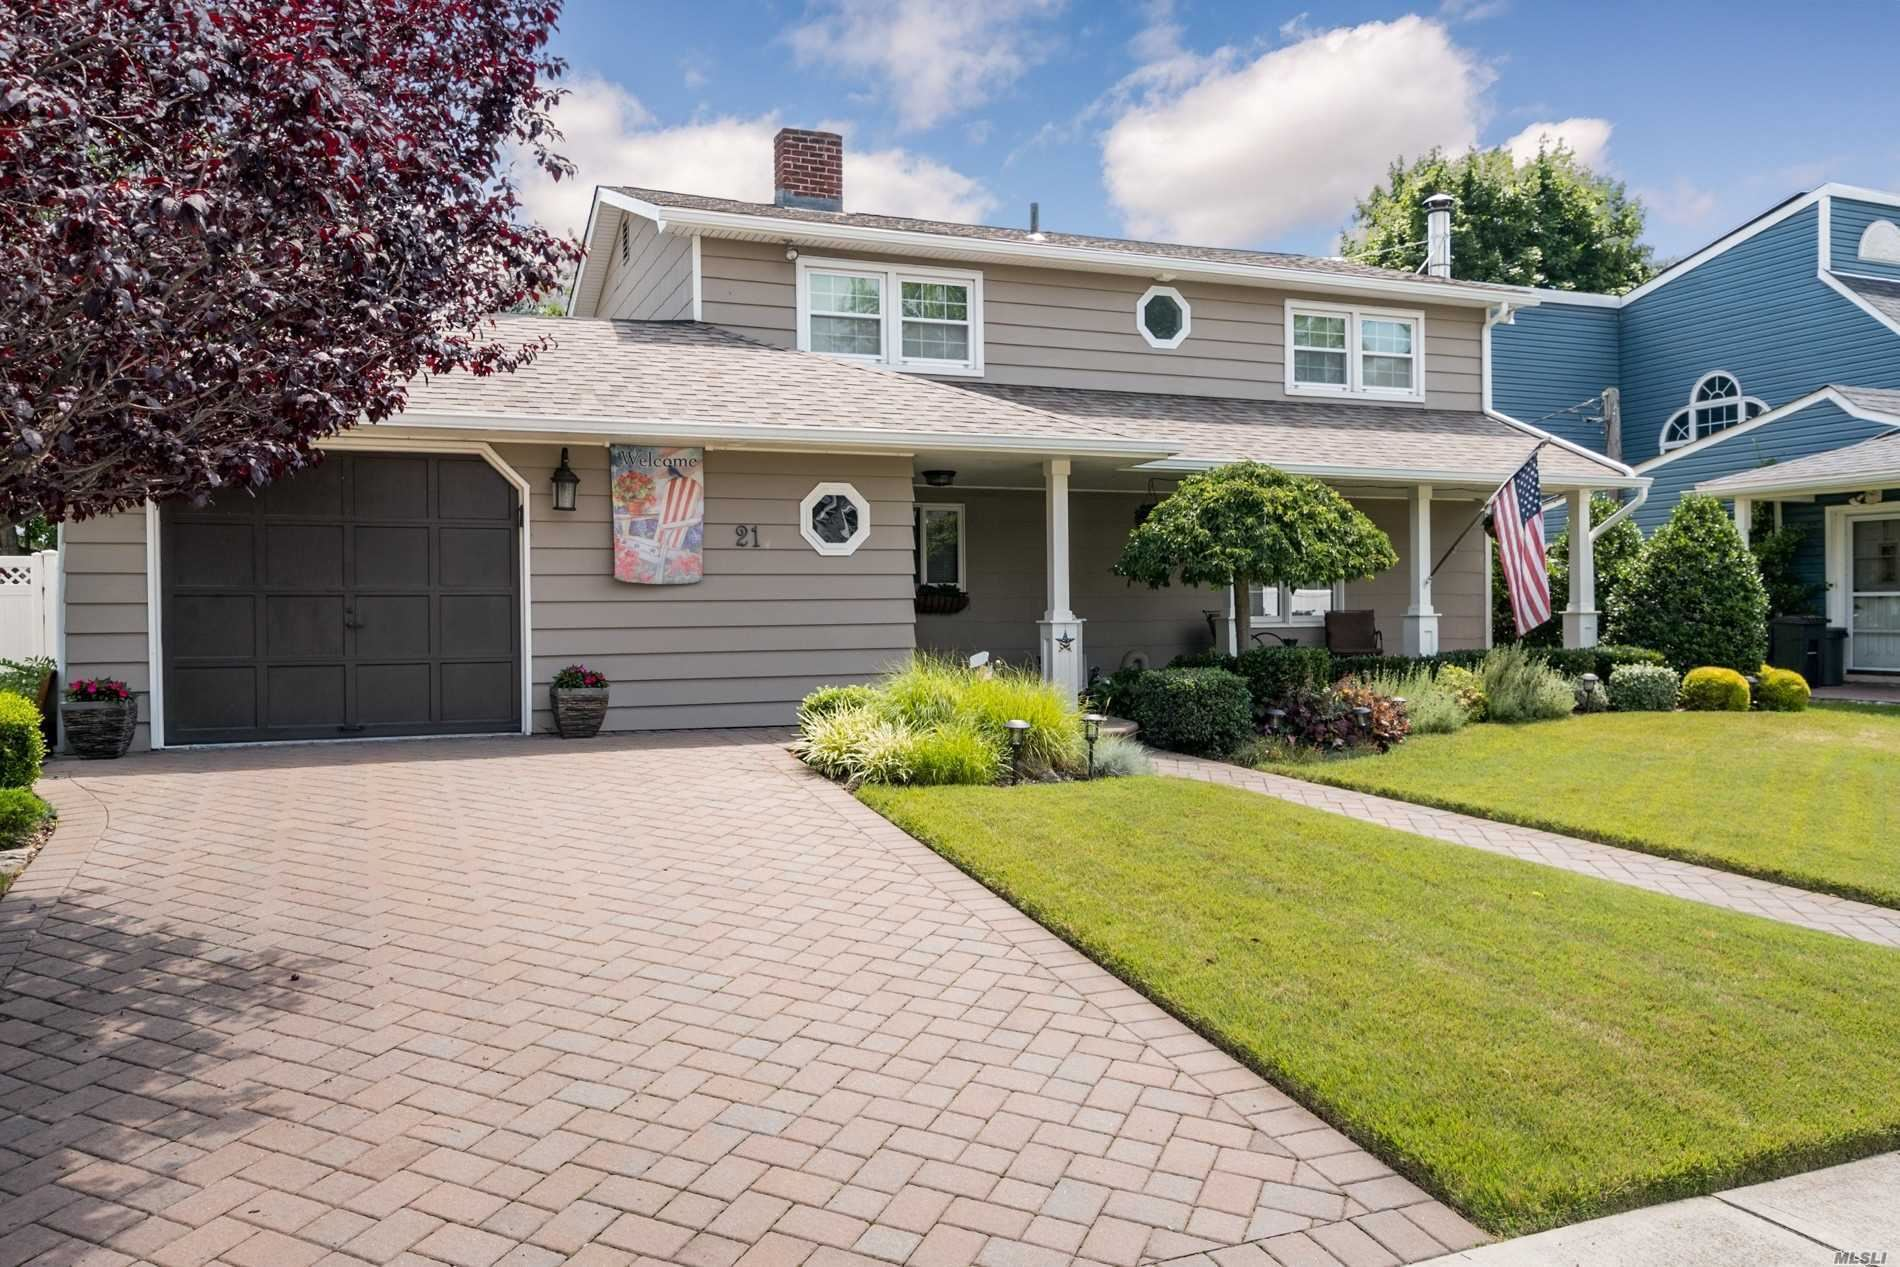 21 Wishbone Ln, Wantagh, NY 11793 - MLS#: 3233399